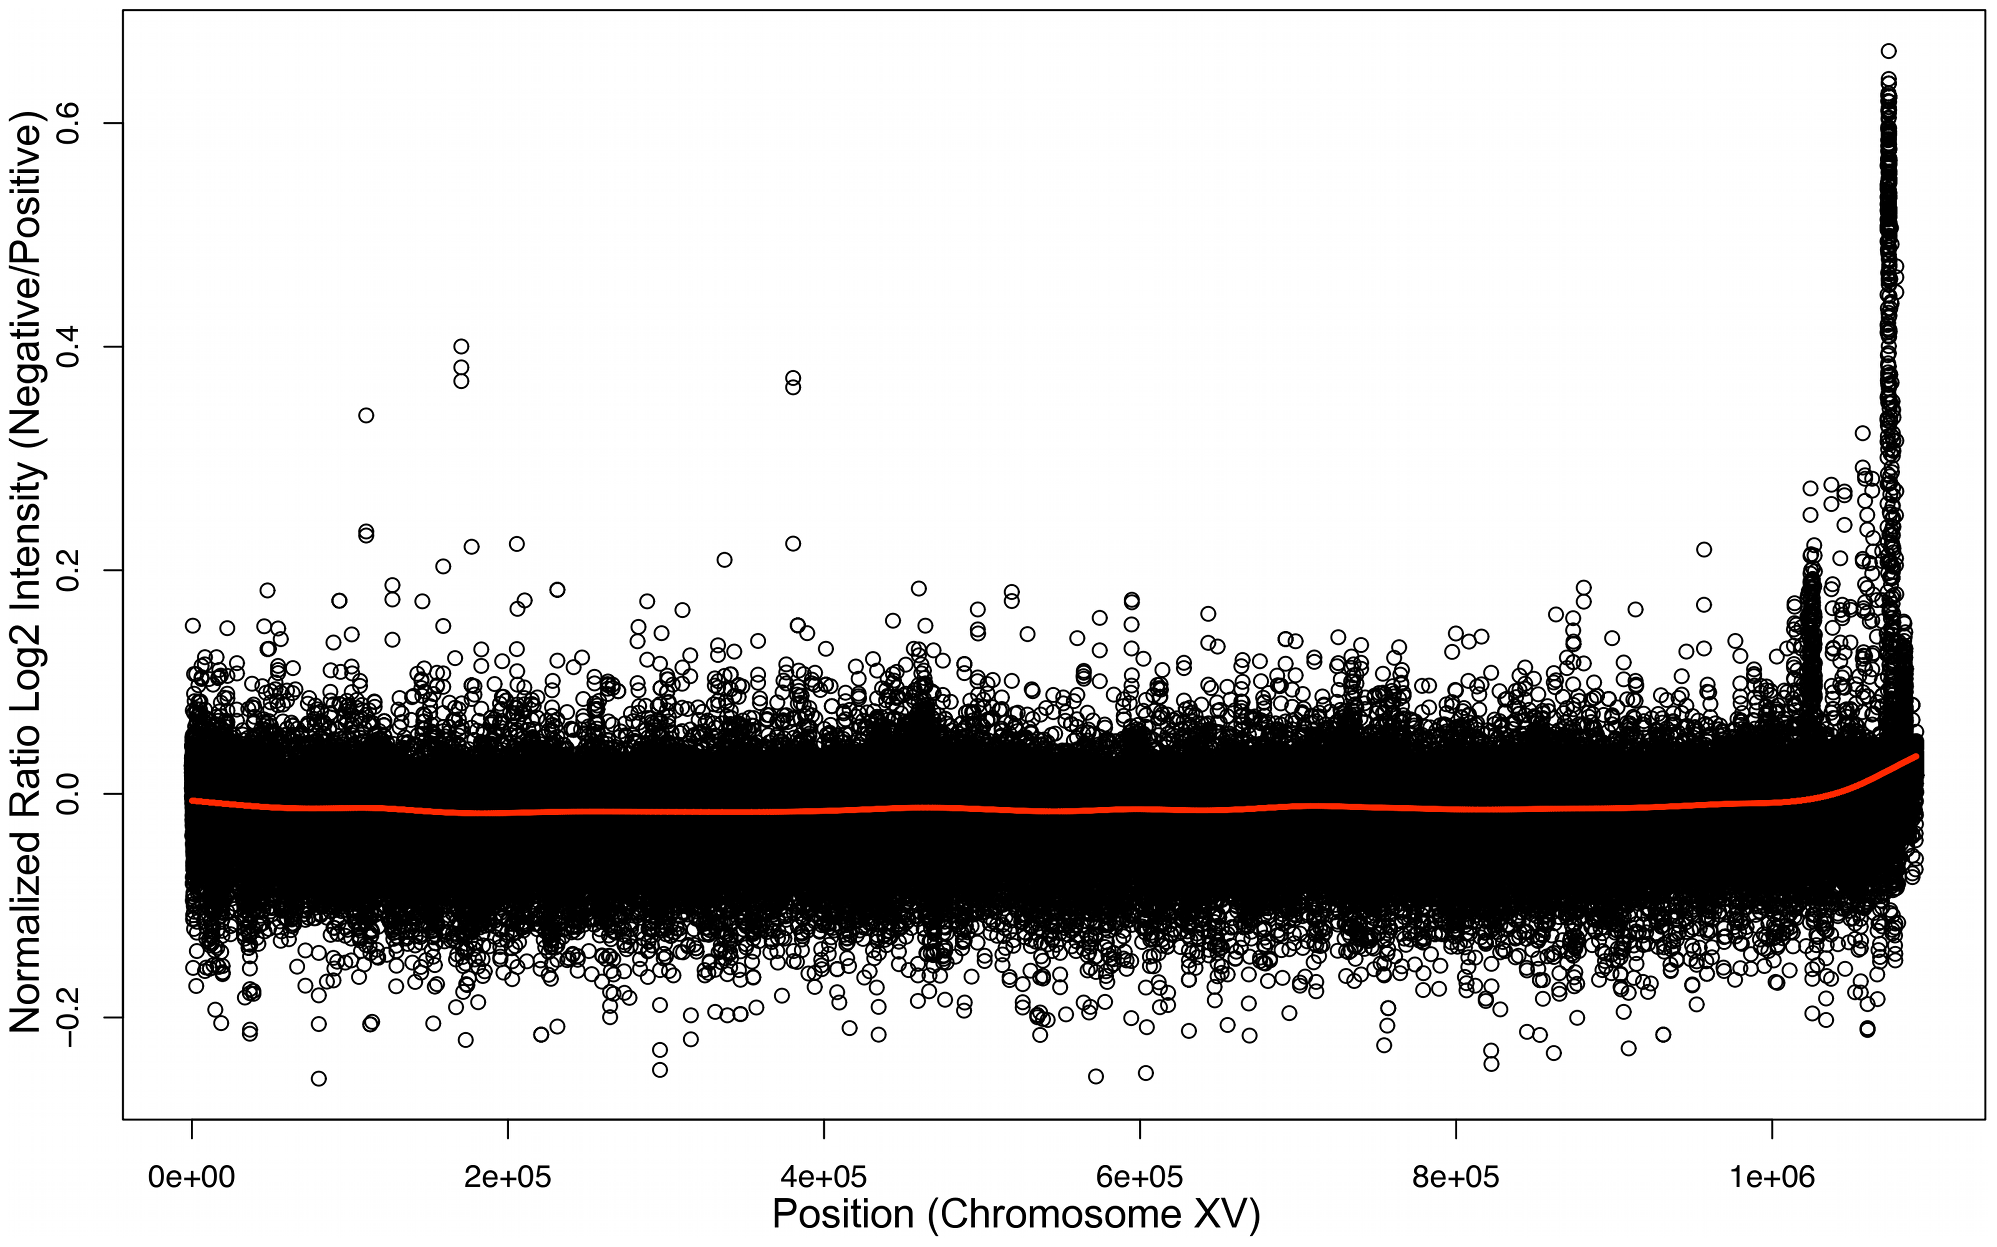 Bulk Segregant Analysis by Affymetrix Yeast tiling microarrays.